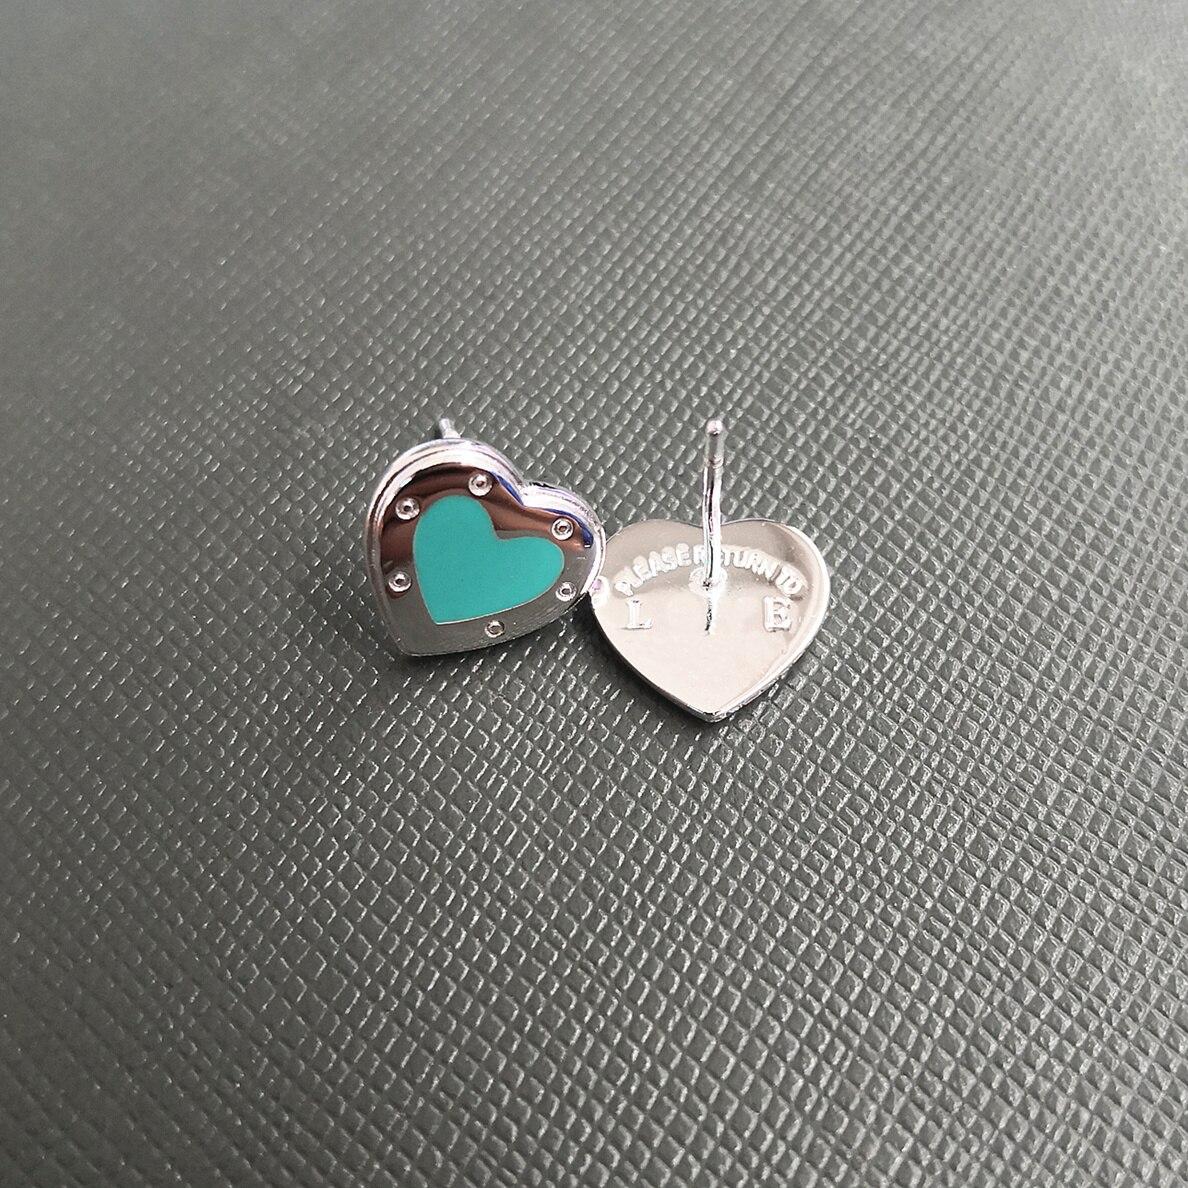 Ms S925 الفضة النقية الكلاسيكية الوردي المينا الفضة على شكل قلب أقراط سماوي الغراء الأزرق على شكل قلب أقراط